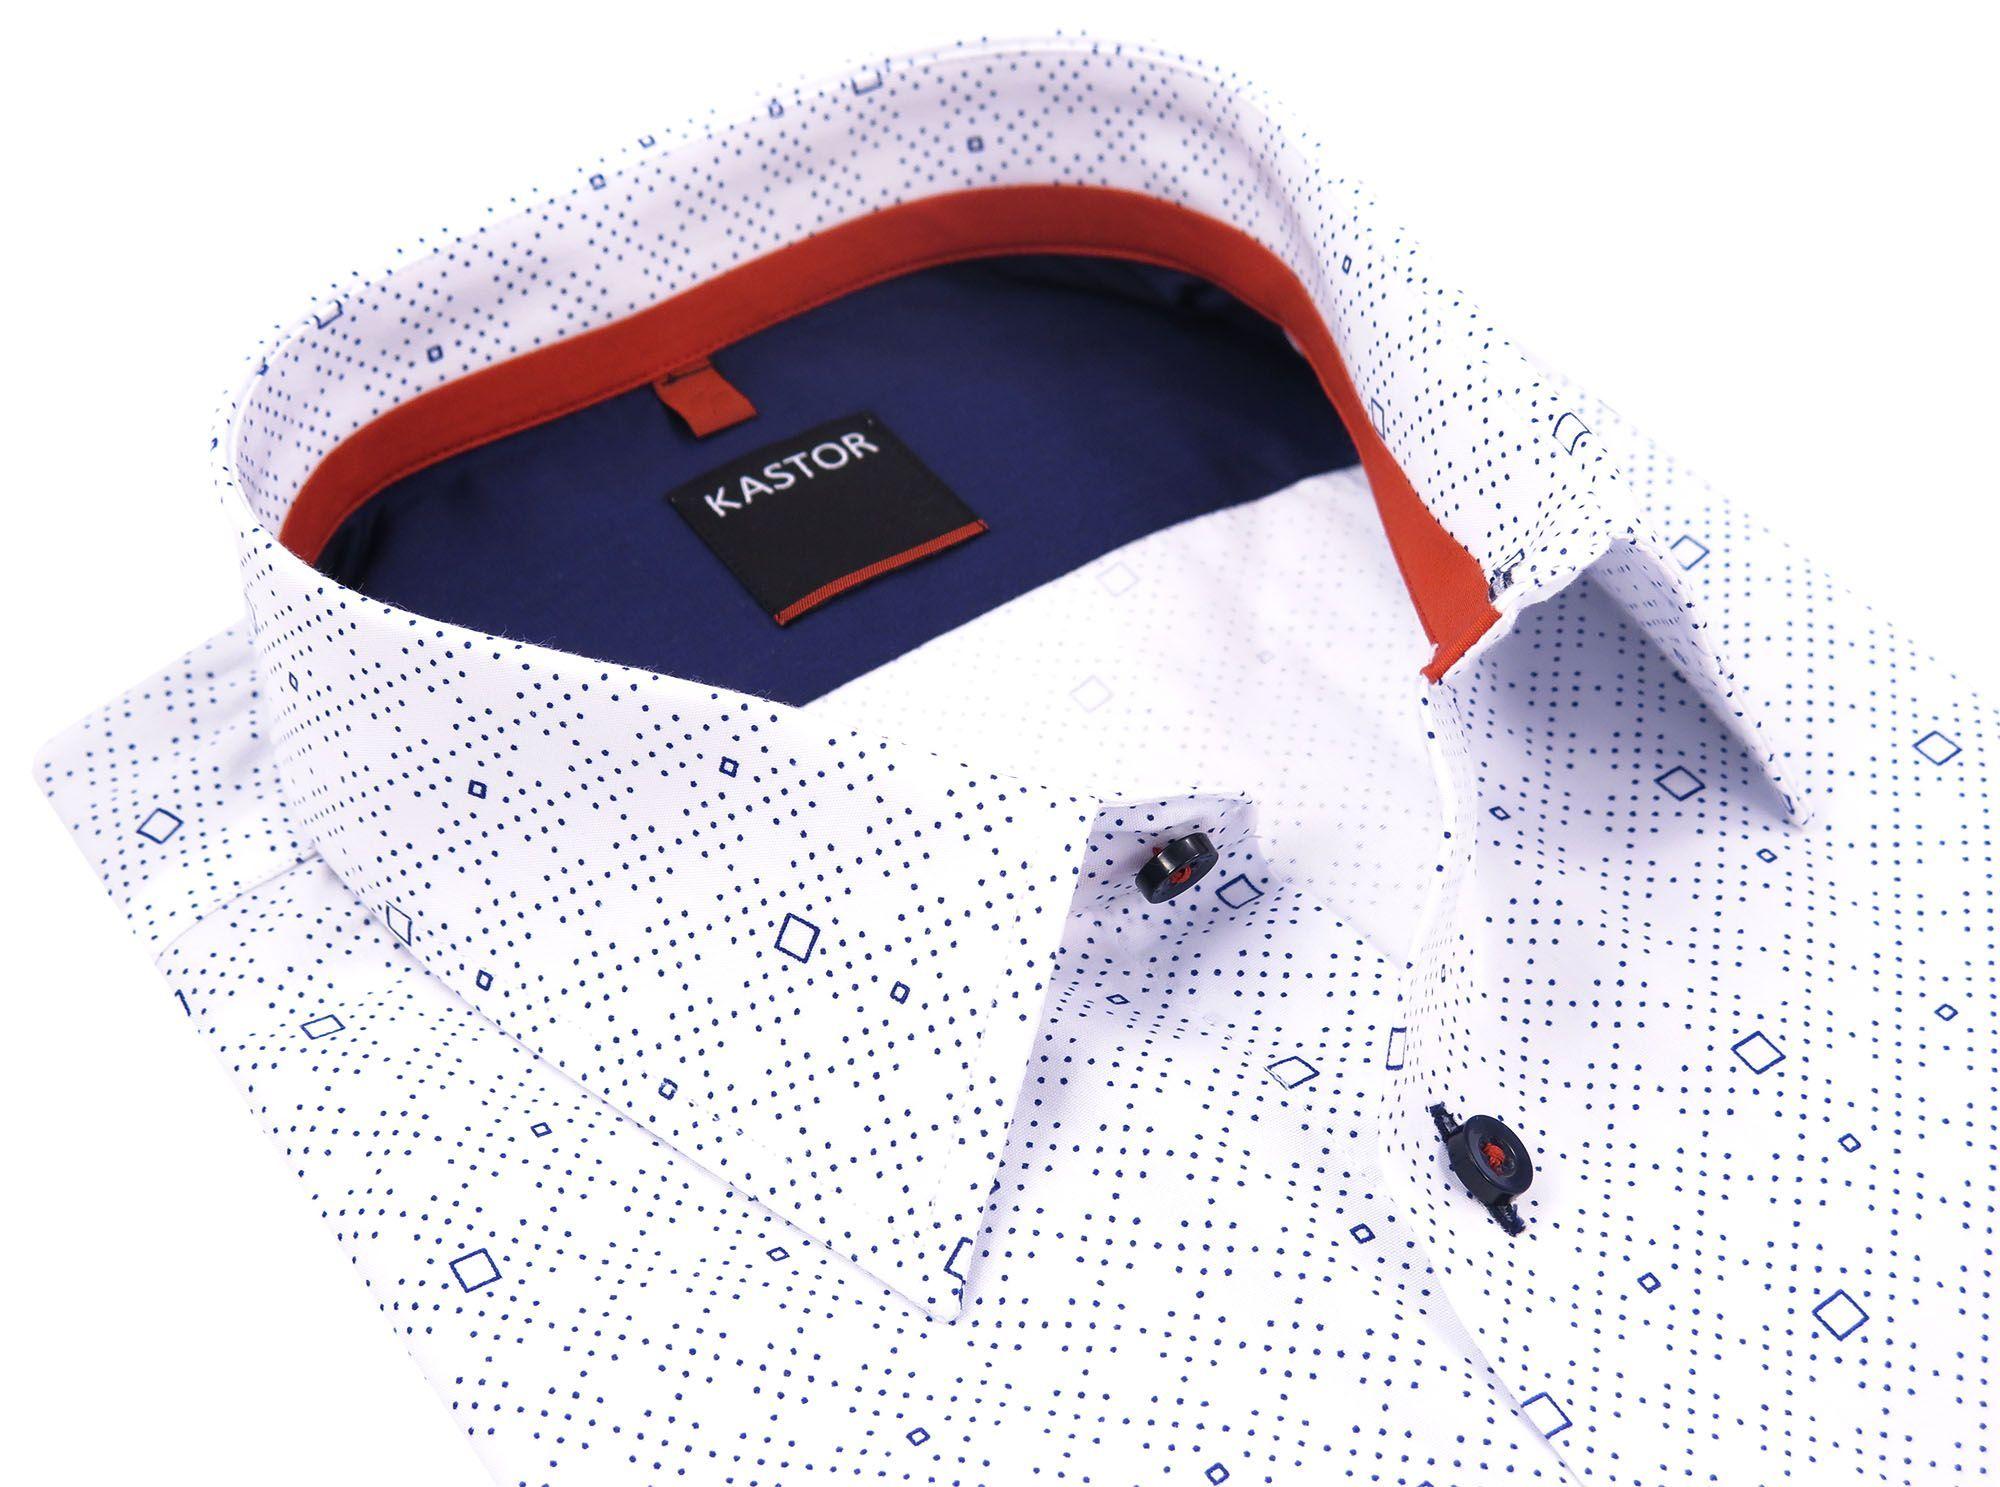 ca3499dba Biała koszula męska KASTOR K46 188-194 43-REGULAR - 7034455004 ...